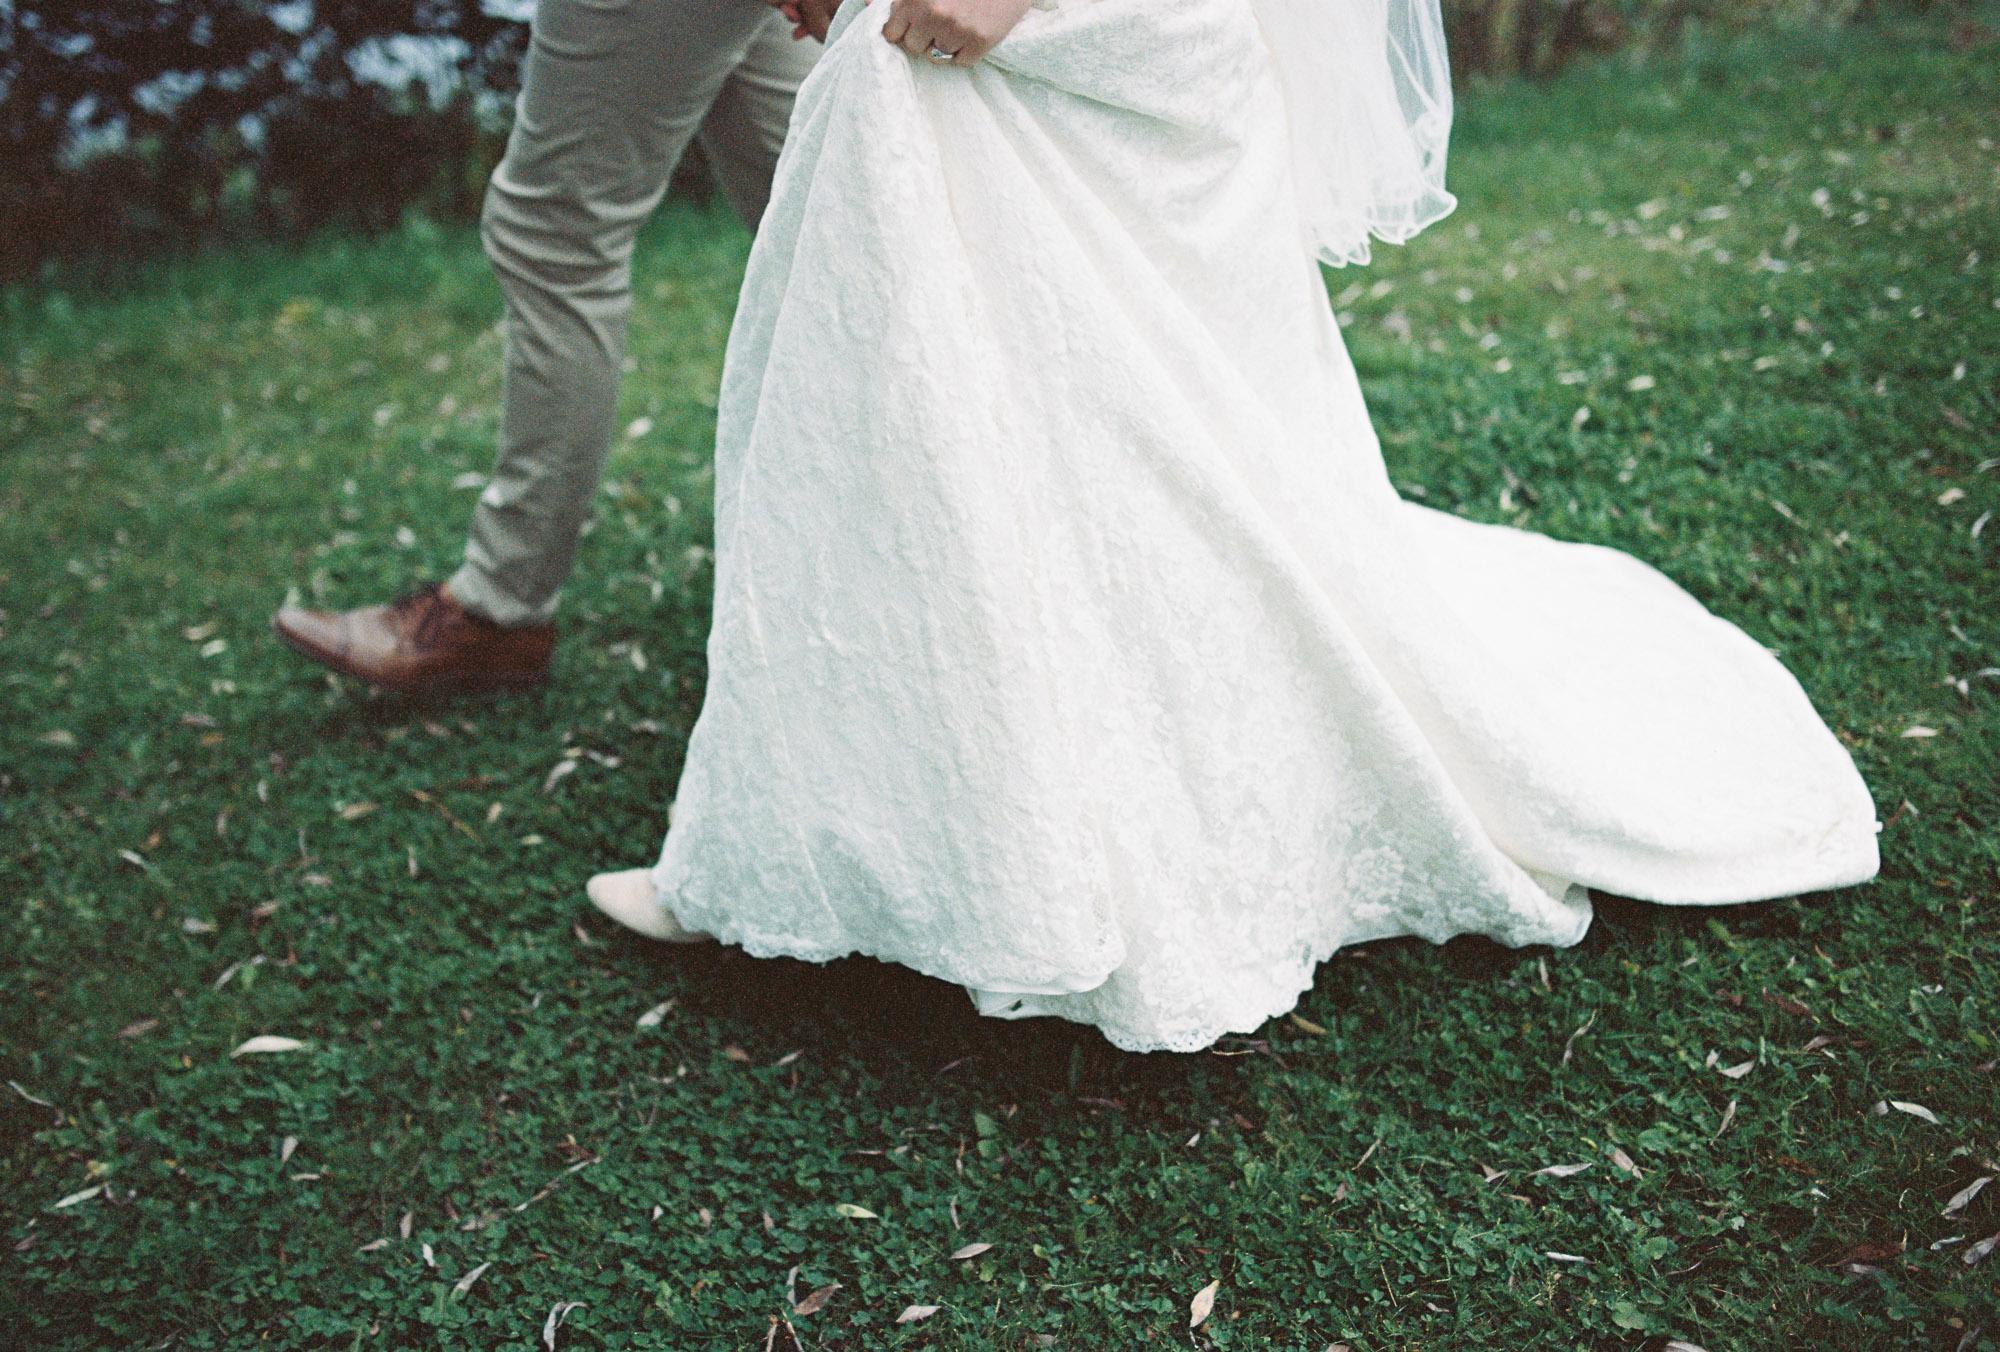 jere-satamo-analog-film-wedding-photographer-finland-148.jpg